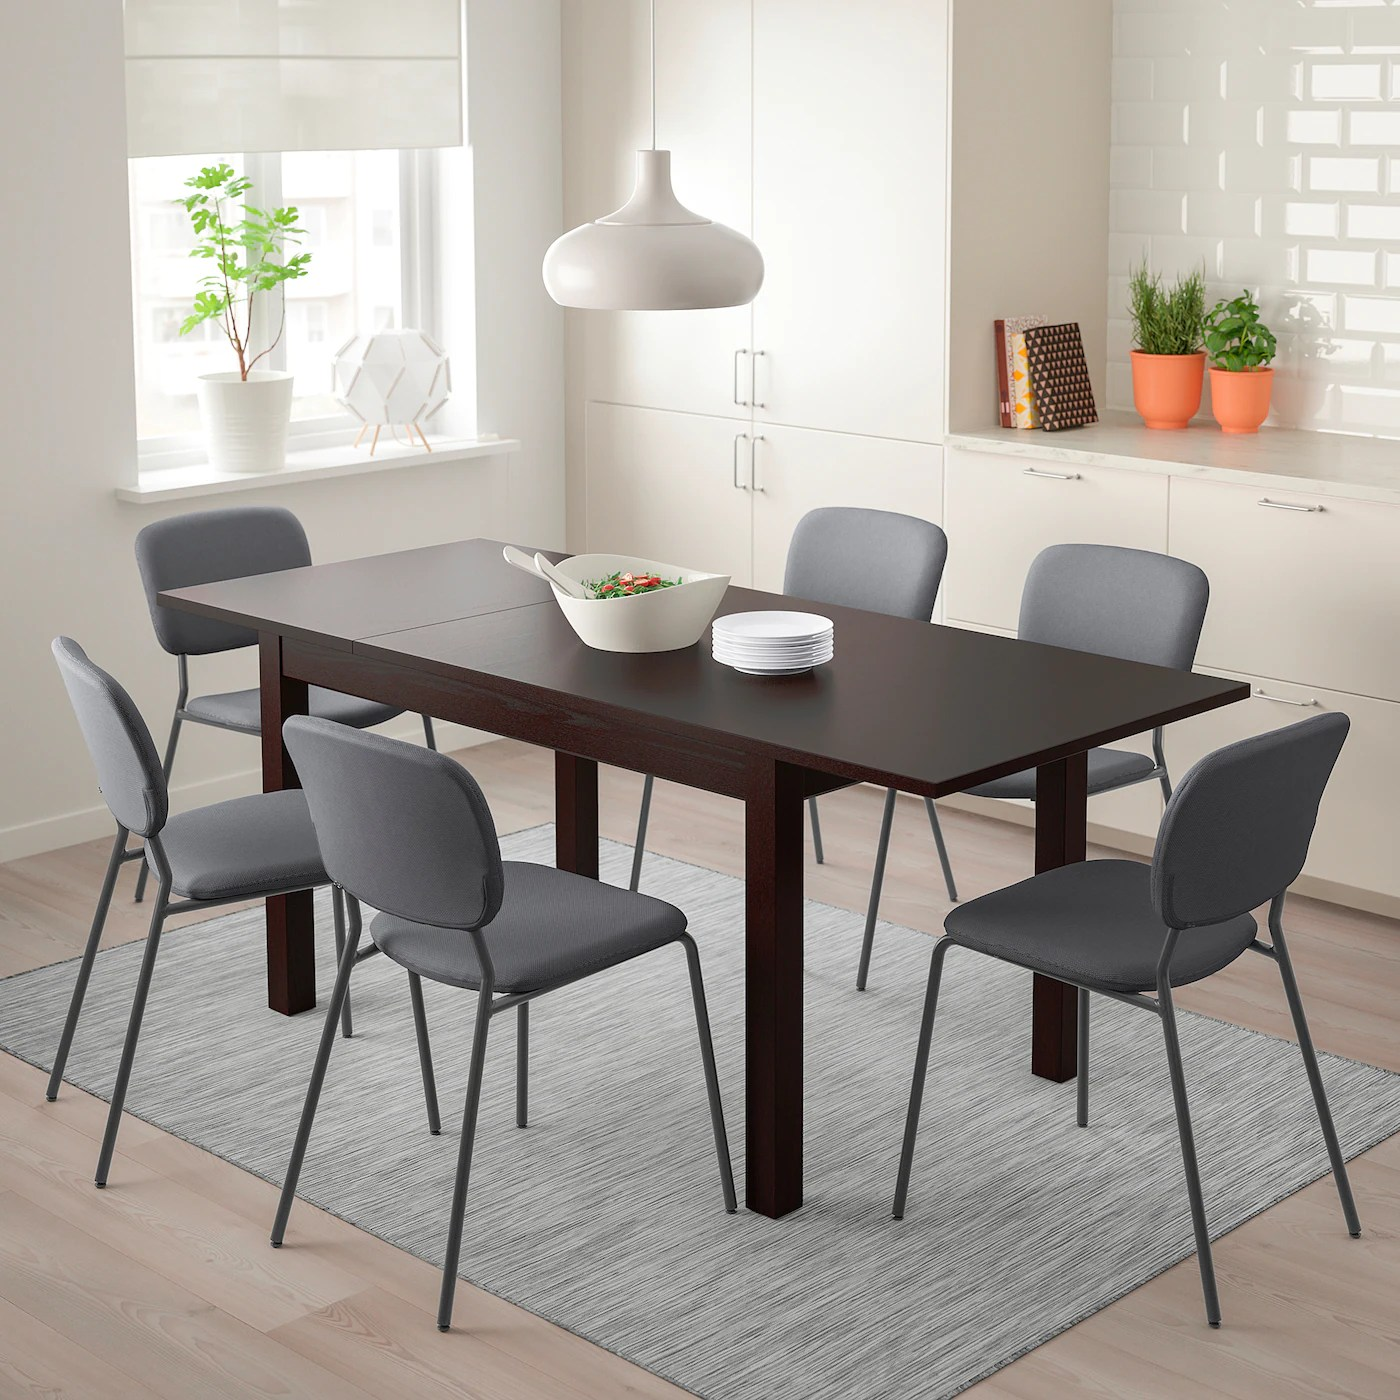 laneberg karljan table et 4 chaises brun gris fonce gris fonce 51 1 8 74 3 4x31 1 2 130 190x80 cm